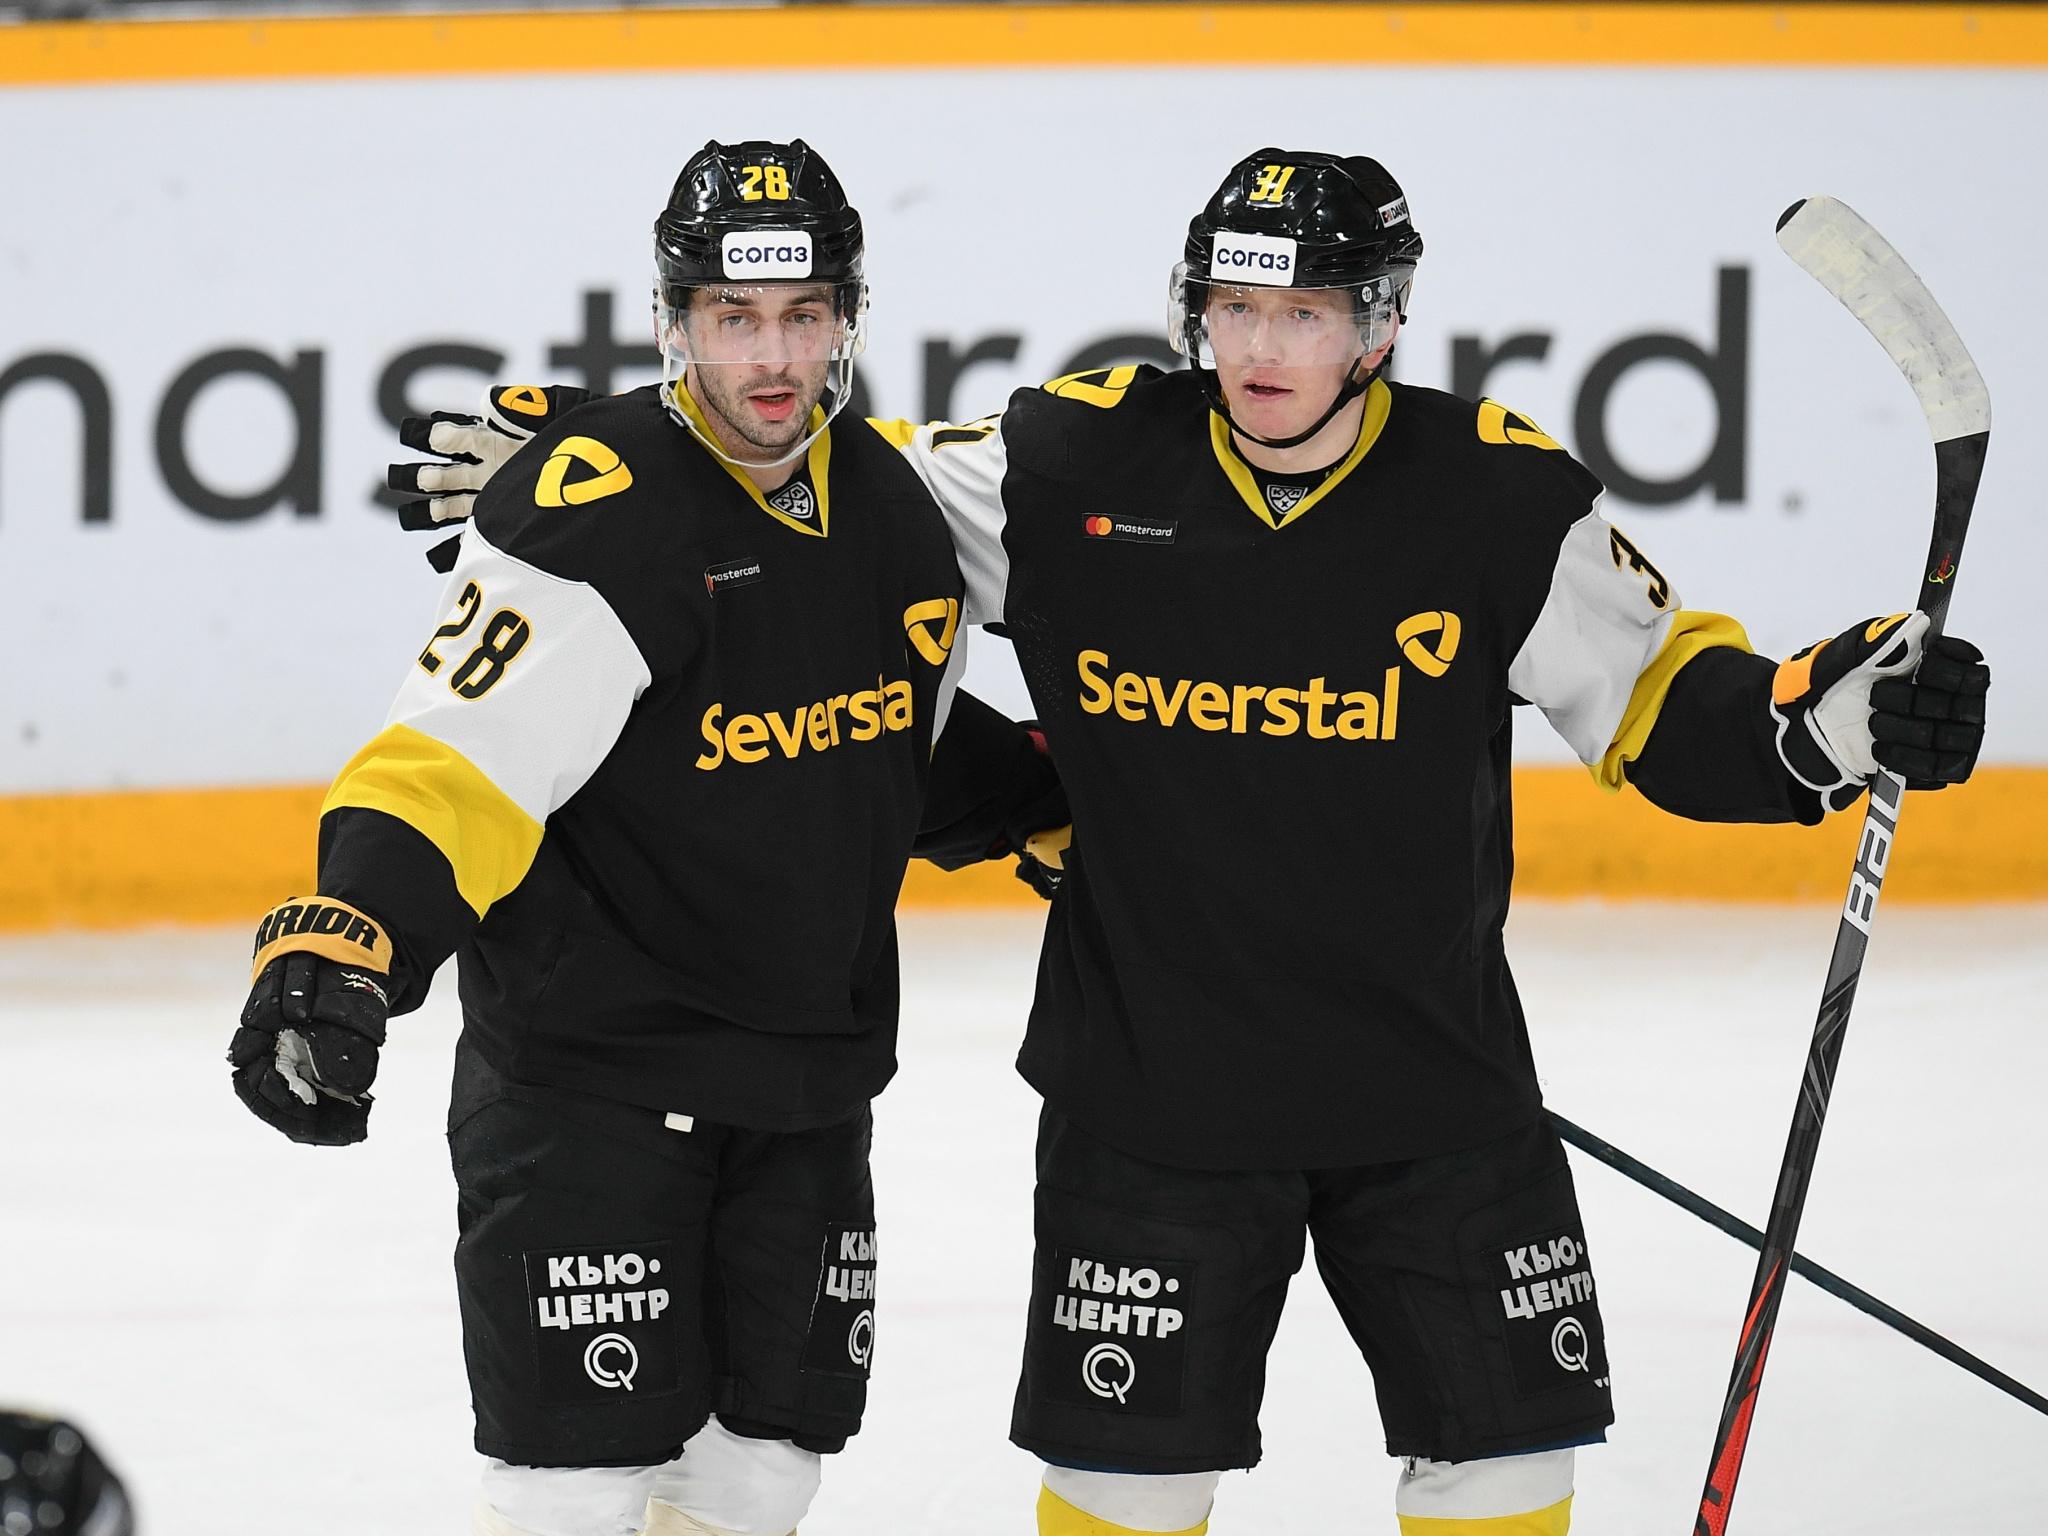 Даниил Вовченко и Александр Петунин. Фото: Александр Коркка